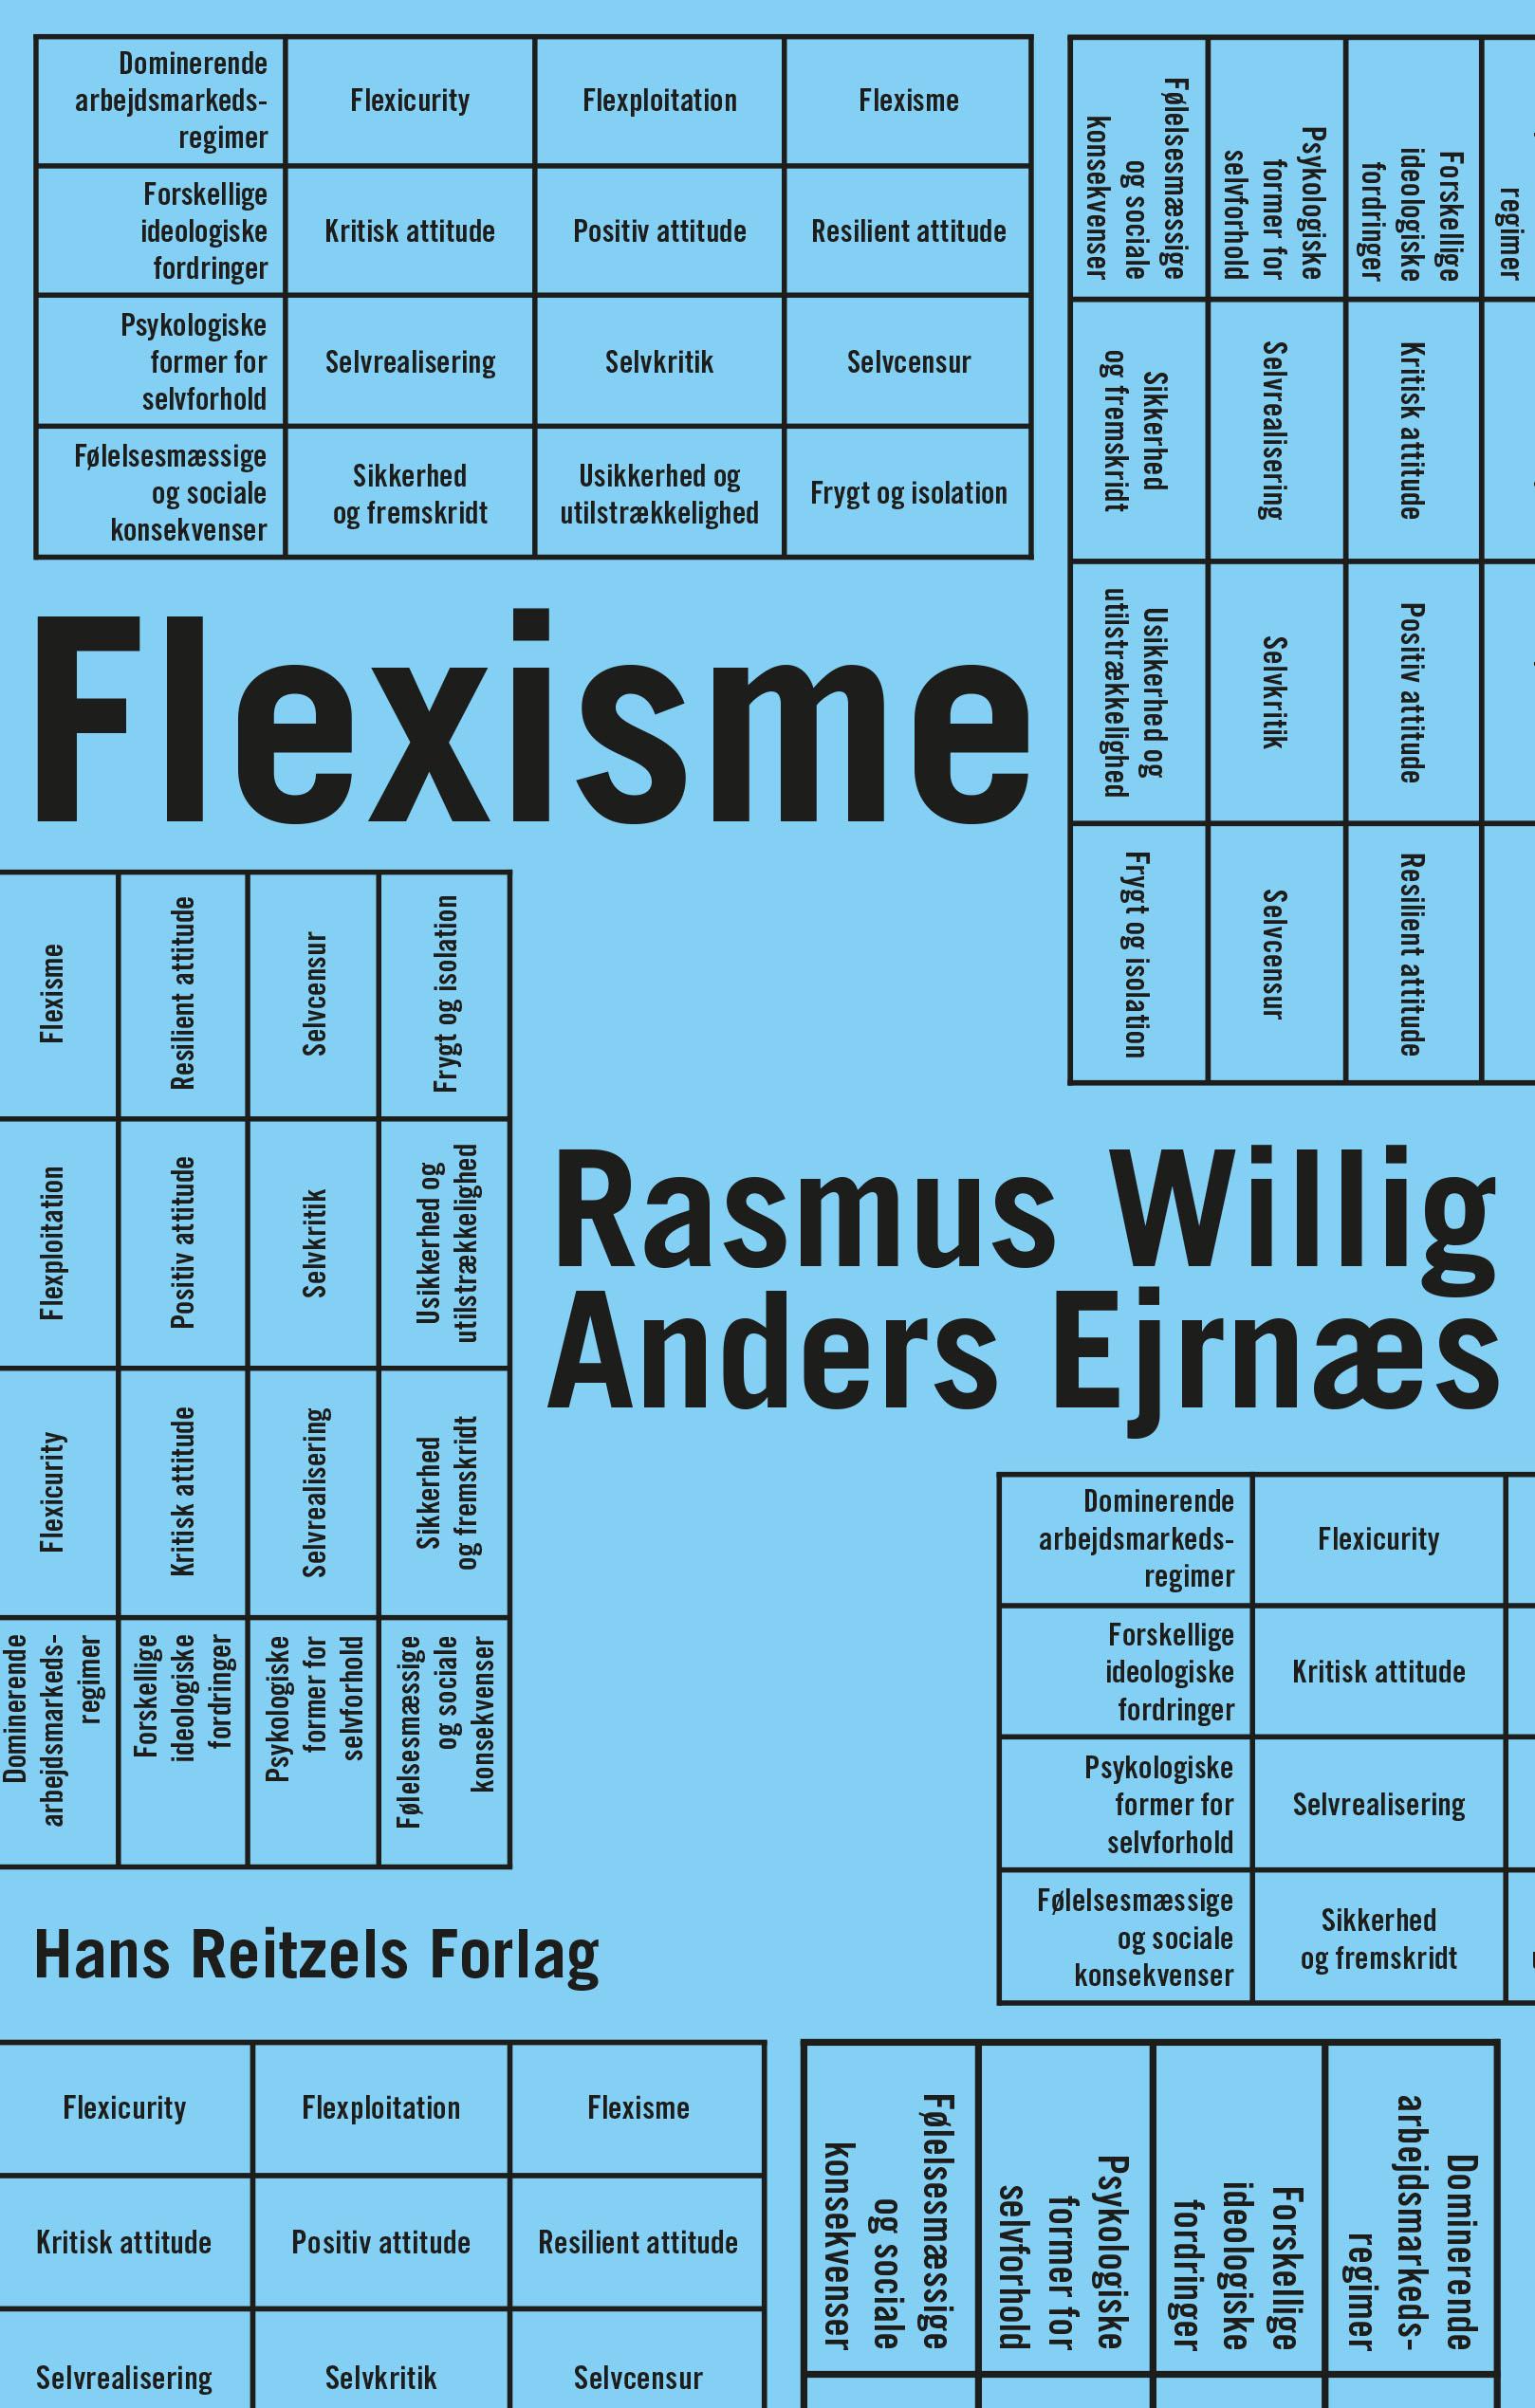 nok Socialt arbejde | Metode - Teori & praksis | Hans Reitzels Forlag GI36